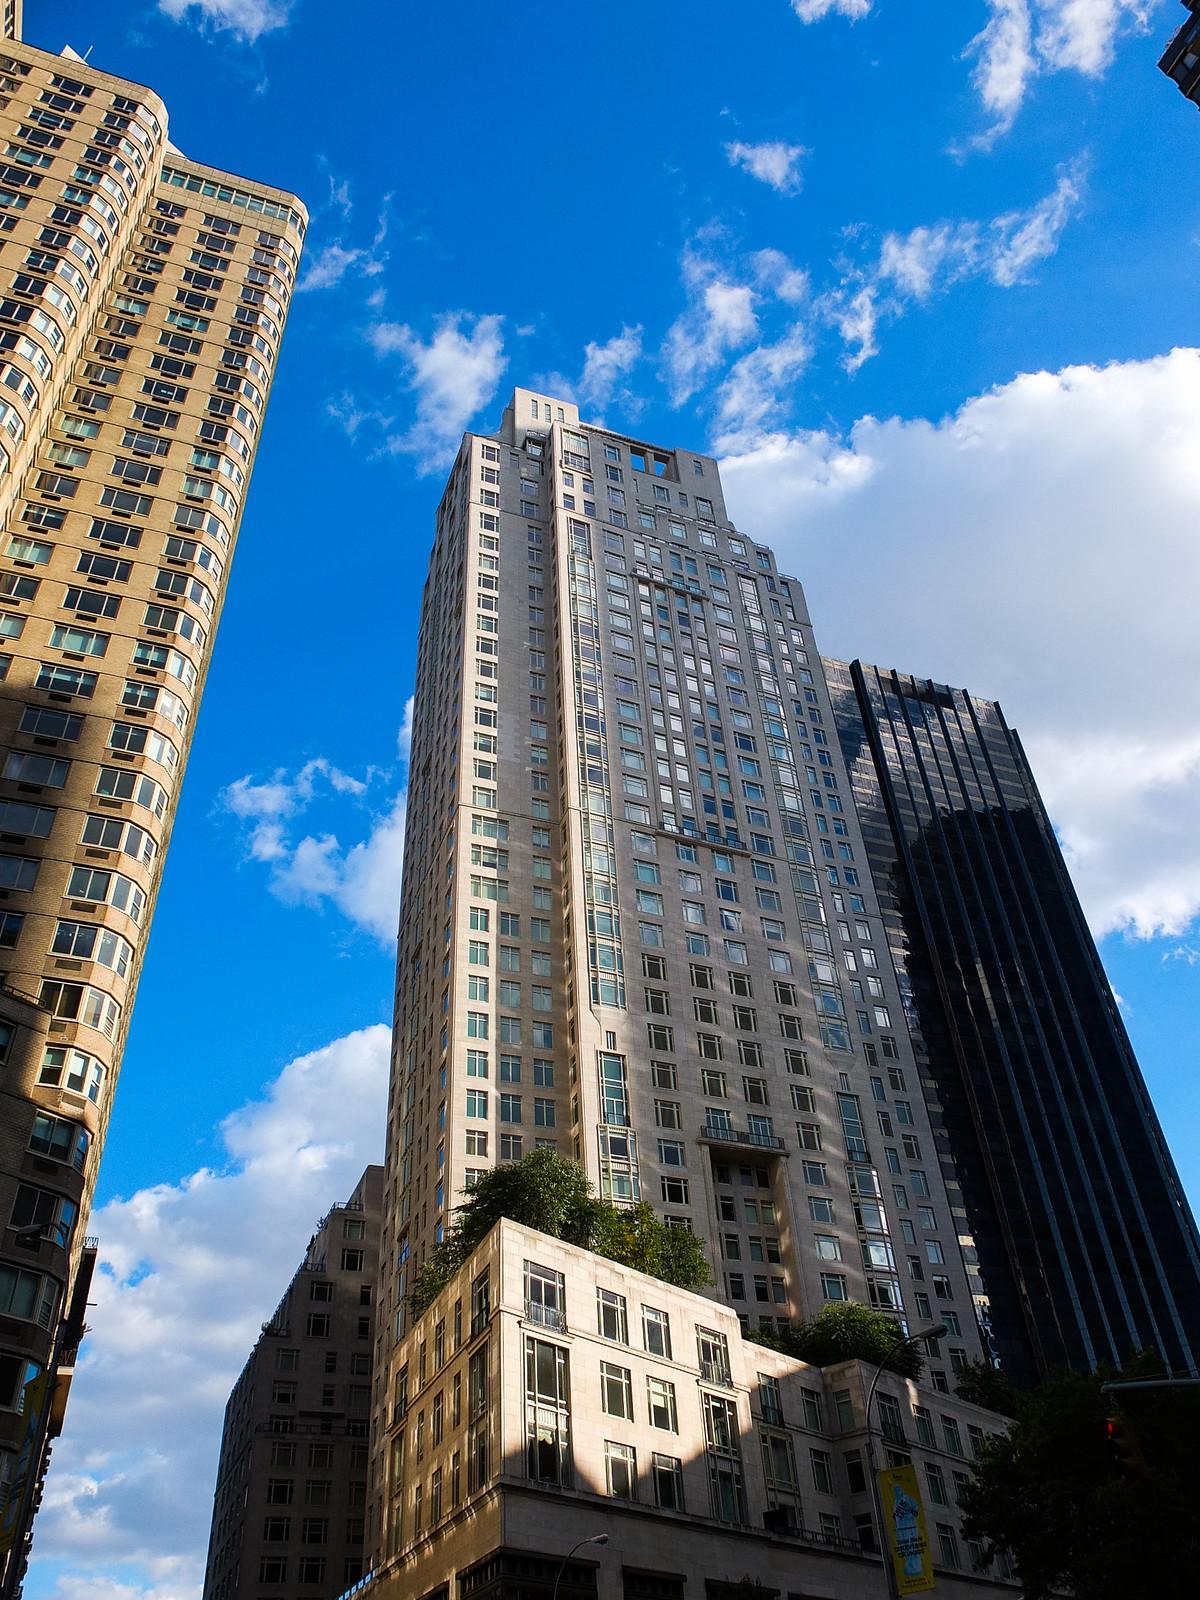 Tower by wwward0